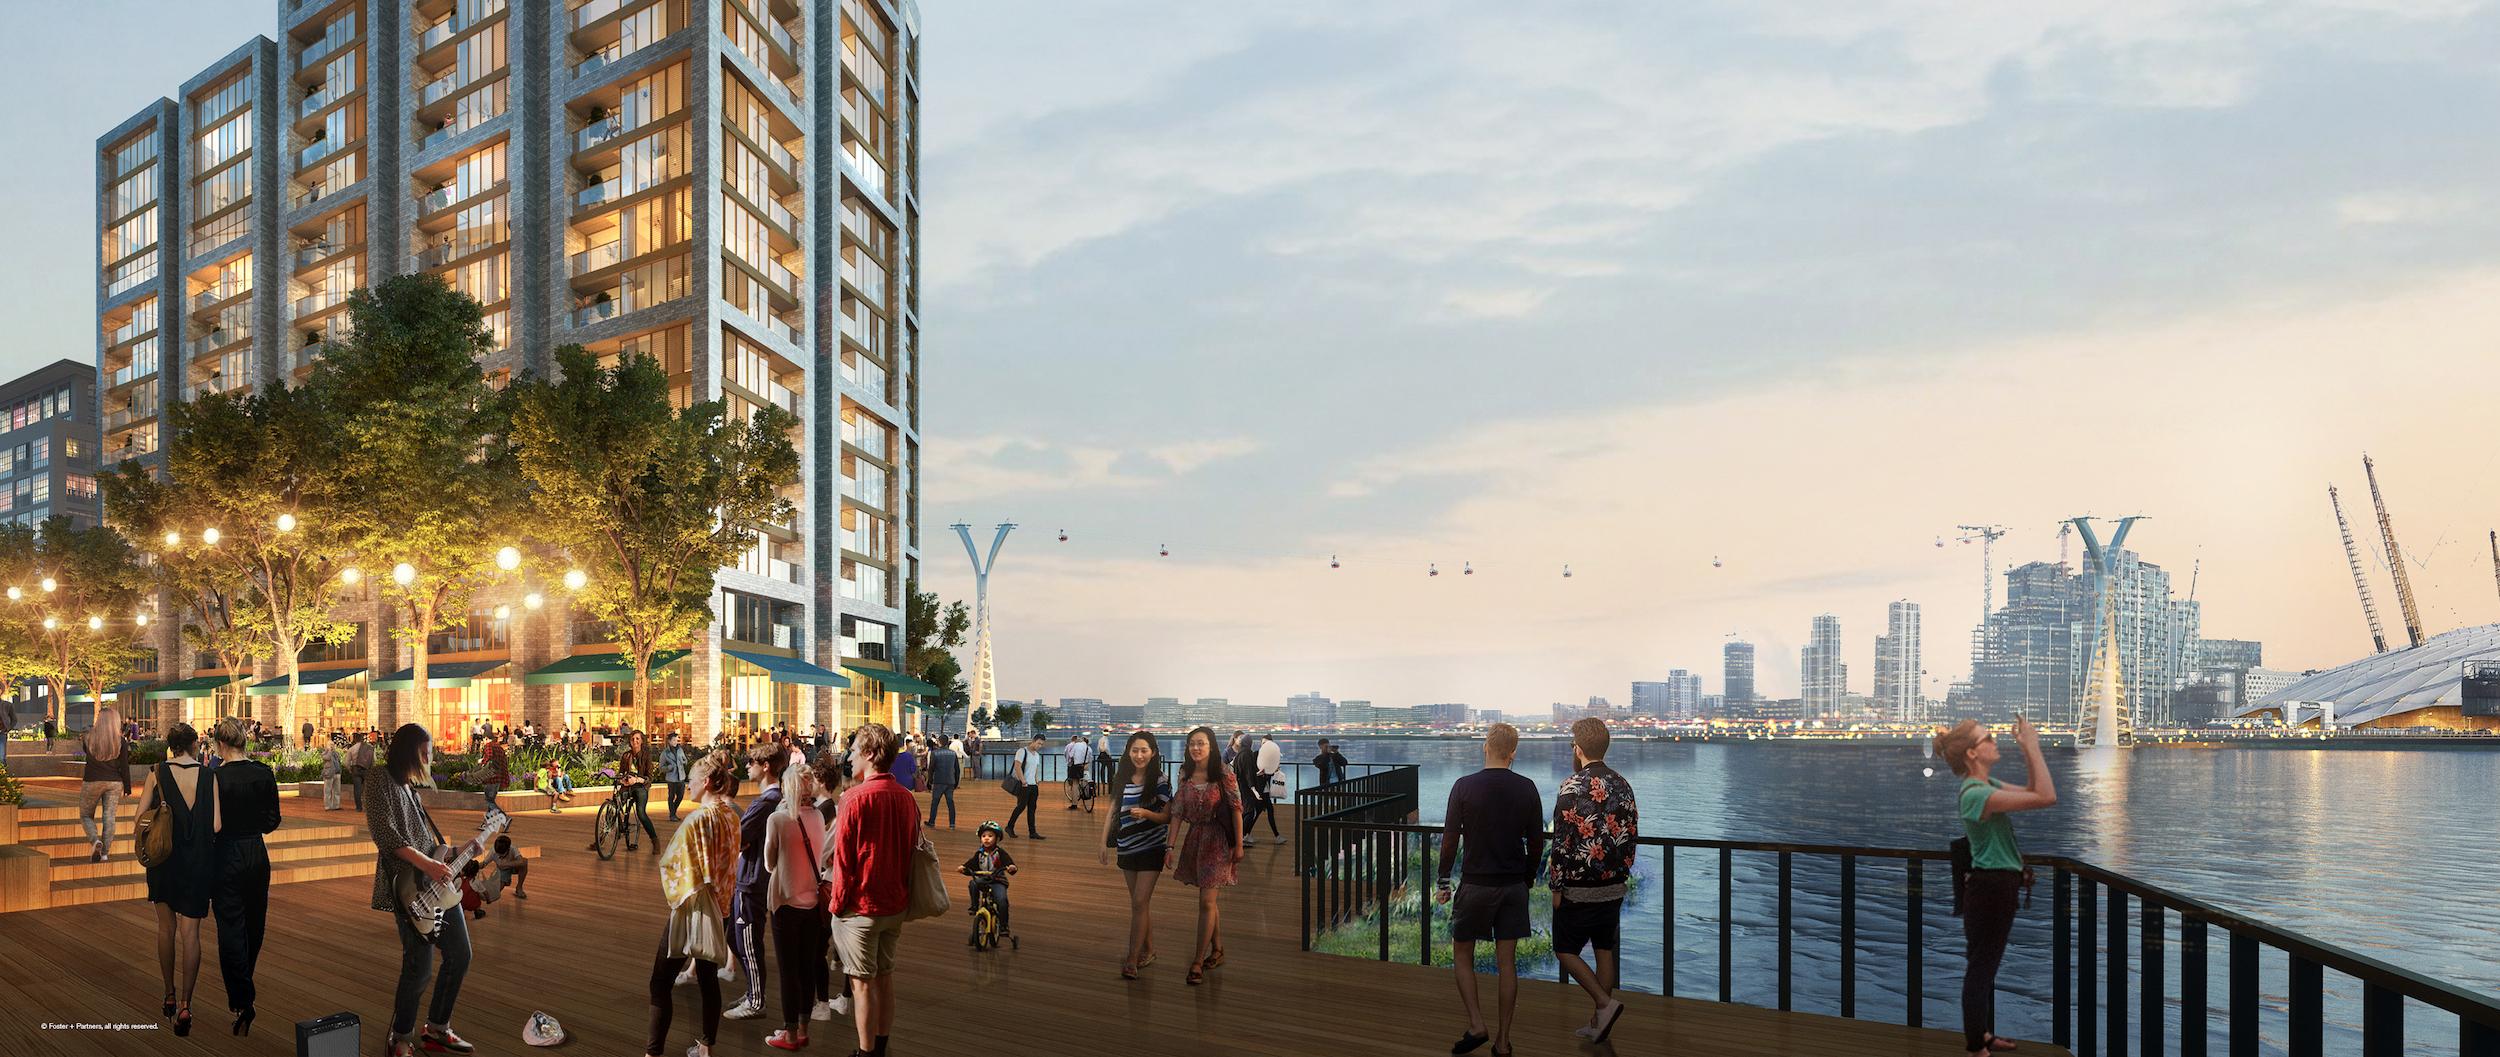 CGI impression of Thameside West development